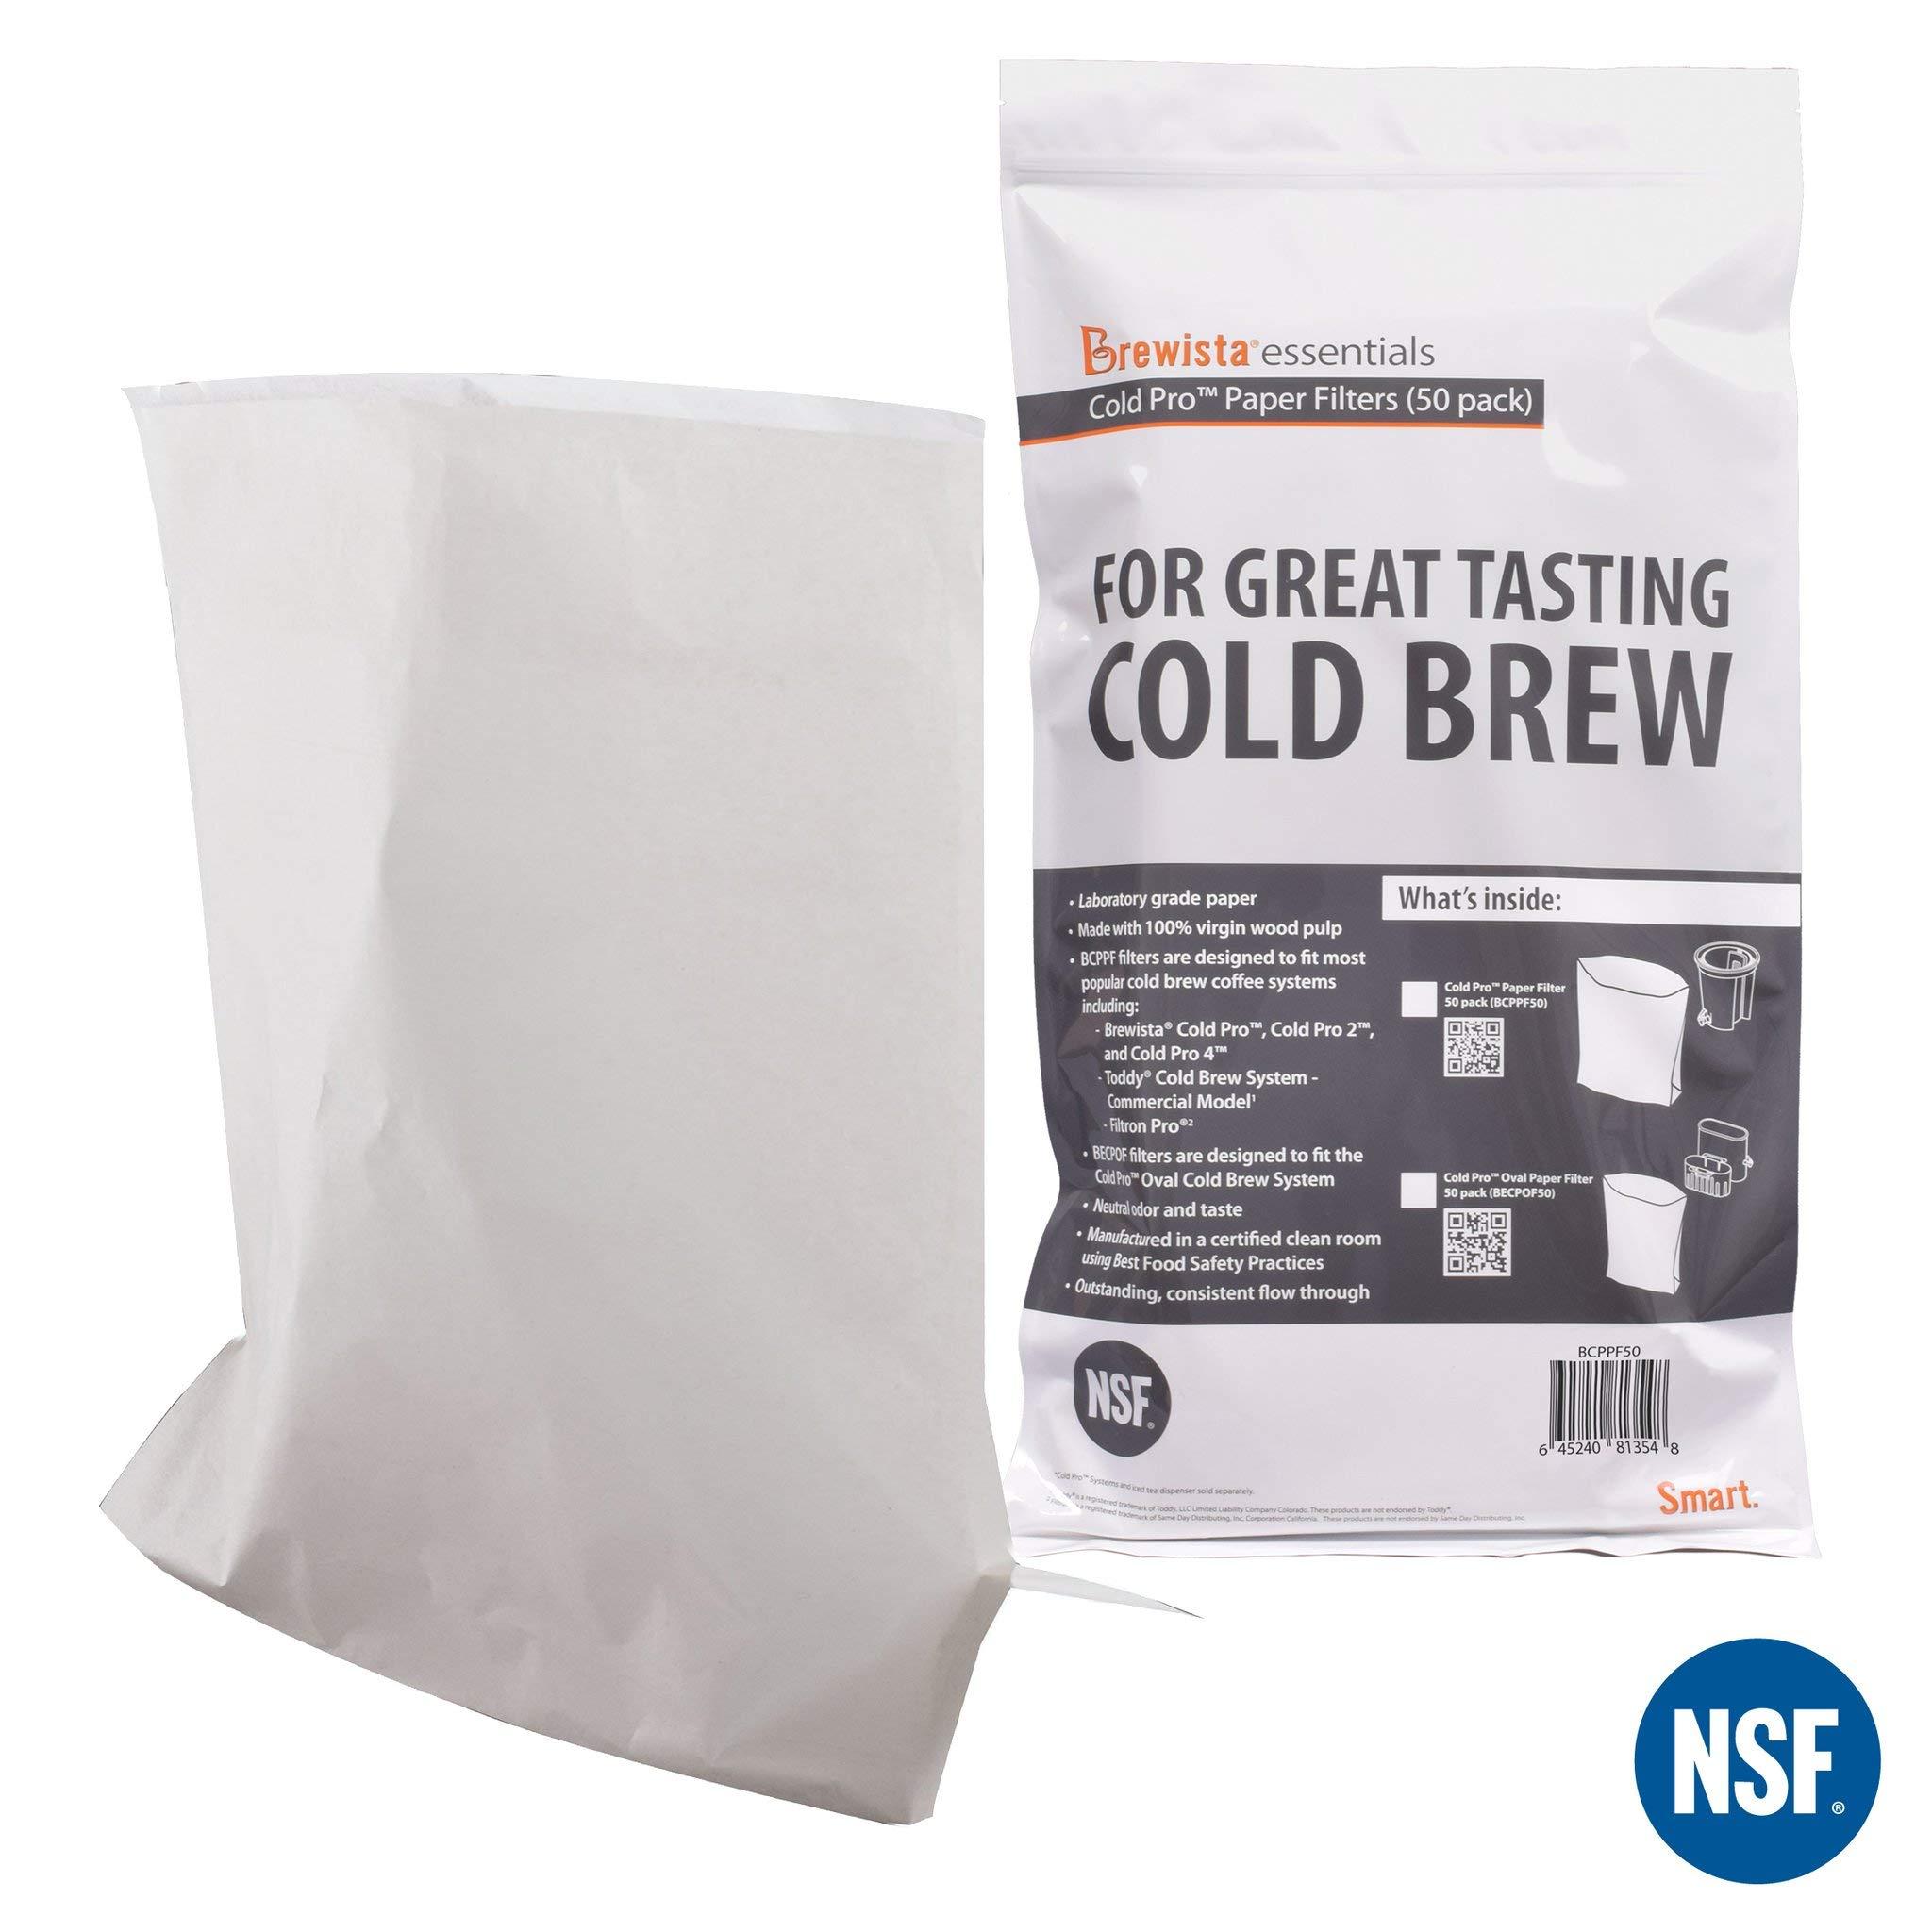 Brewista Cold Pro Original Paper Filter - 50 Pack (BCPPF50) by Brewista